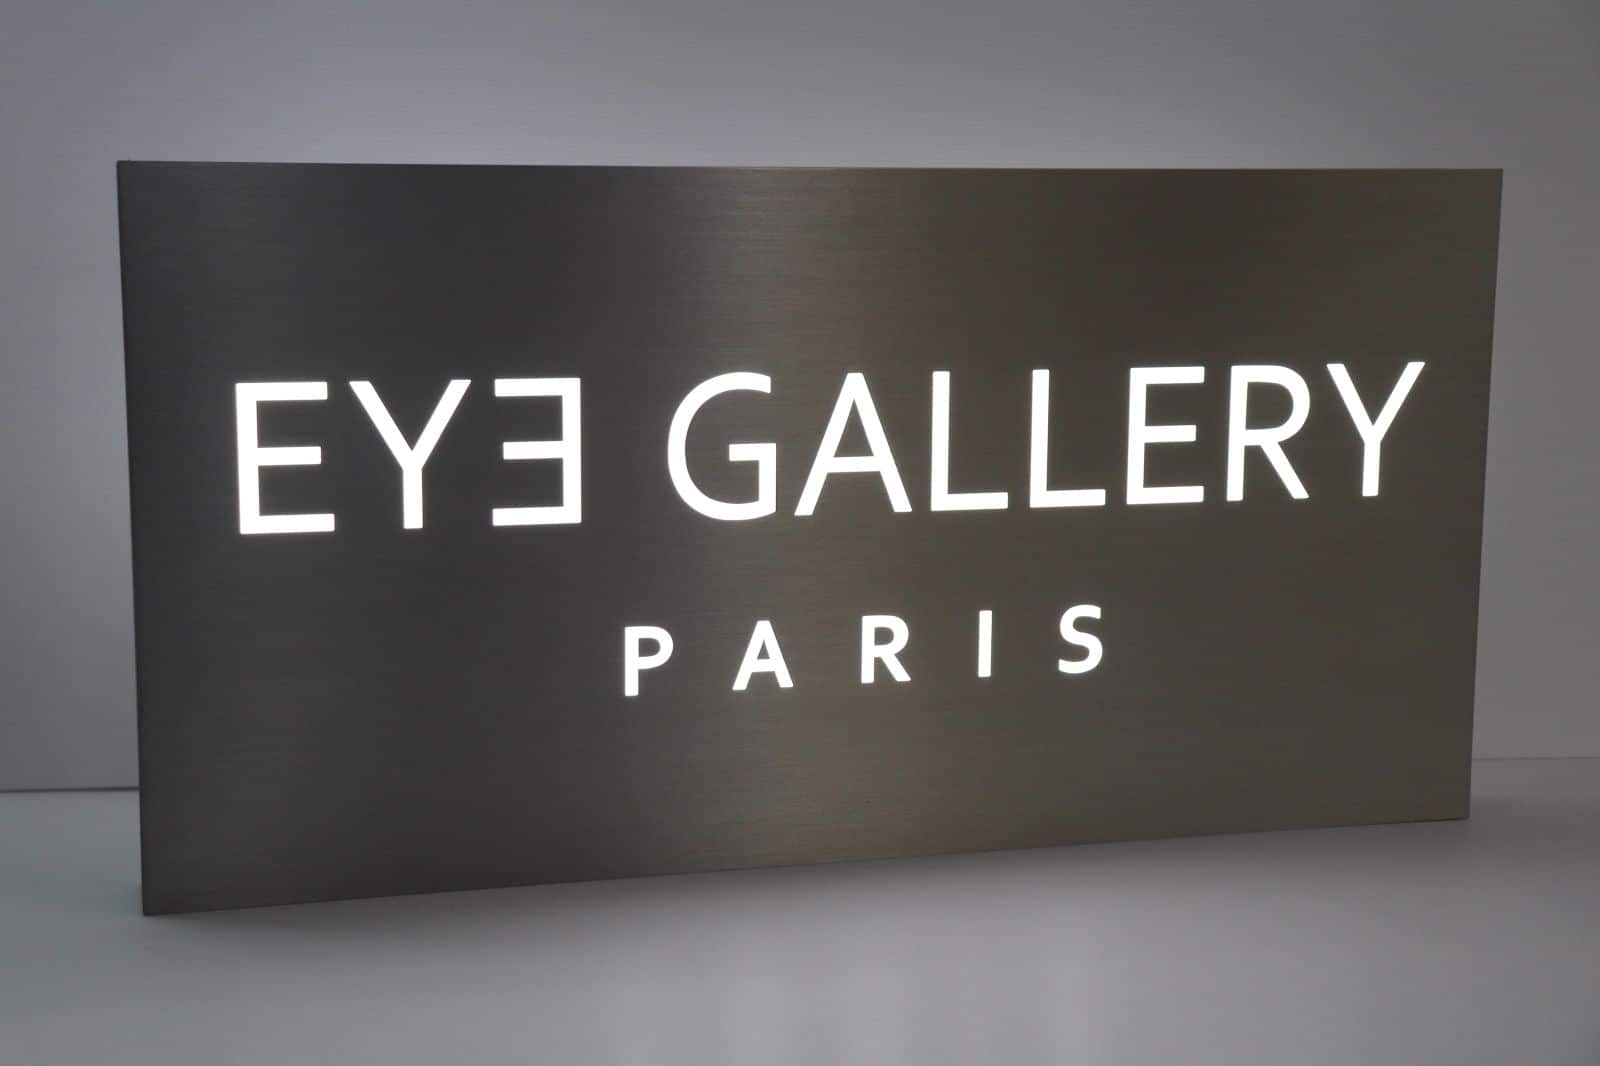 enseigne-metal-soins-beaute-paris-eye-gallery-2